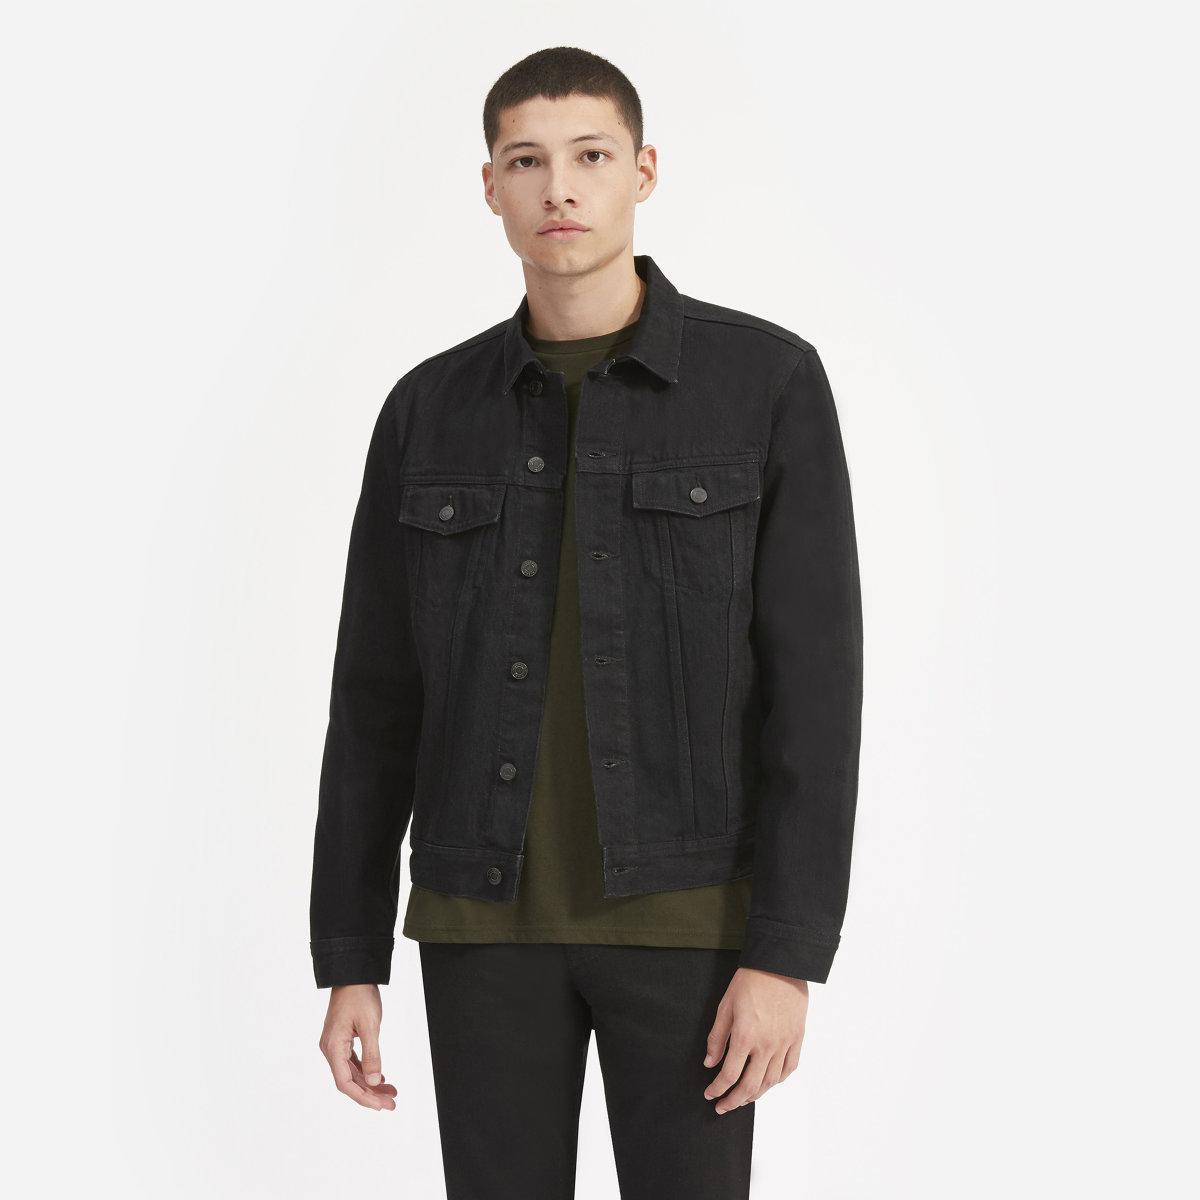 19c0229c0 The Denim Jacket